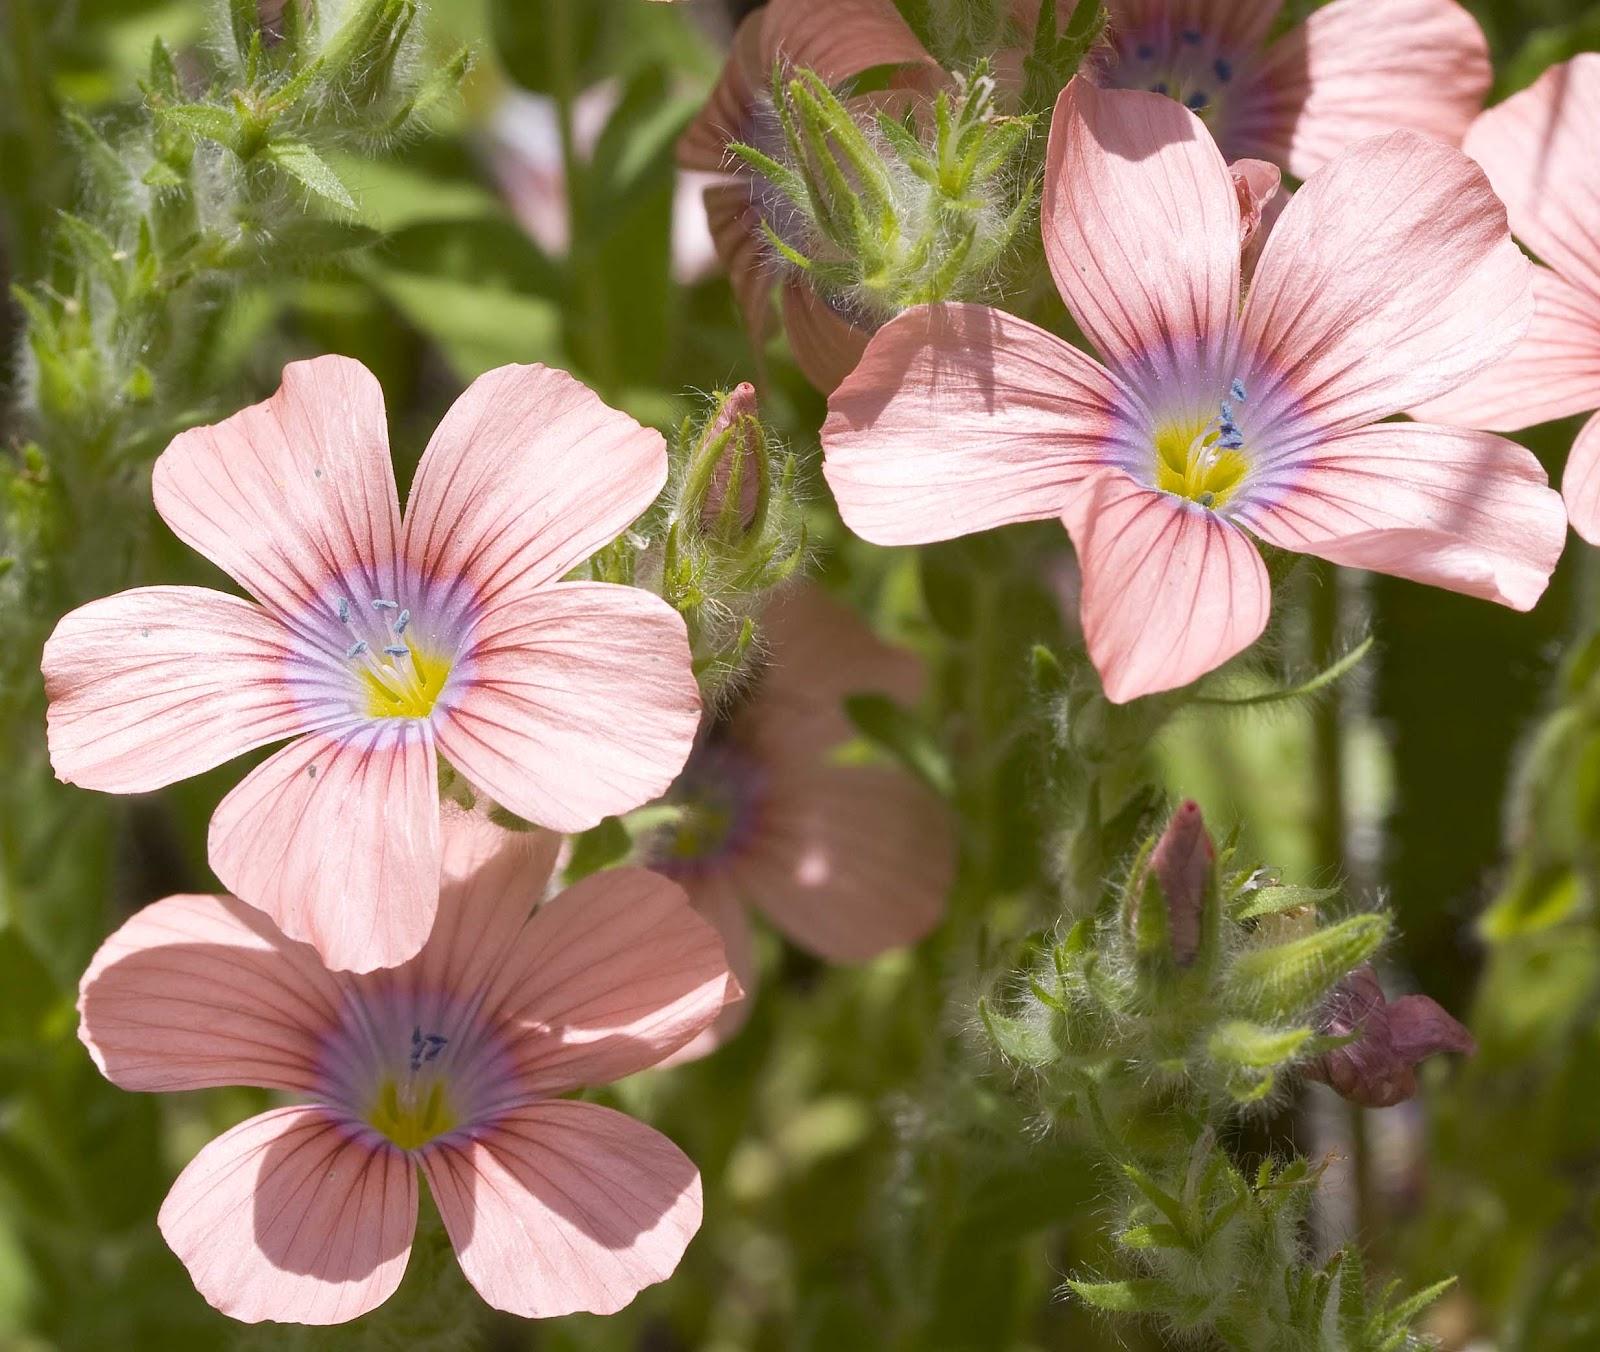 http://4.bp.blogspot.com/-1M9PsLIhgzU/UBNvm7pySQI/AAAAAAAAAmQ/DA-aO4jqE8U/s1600/wildflowers1.jpg